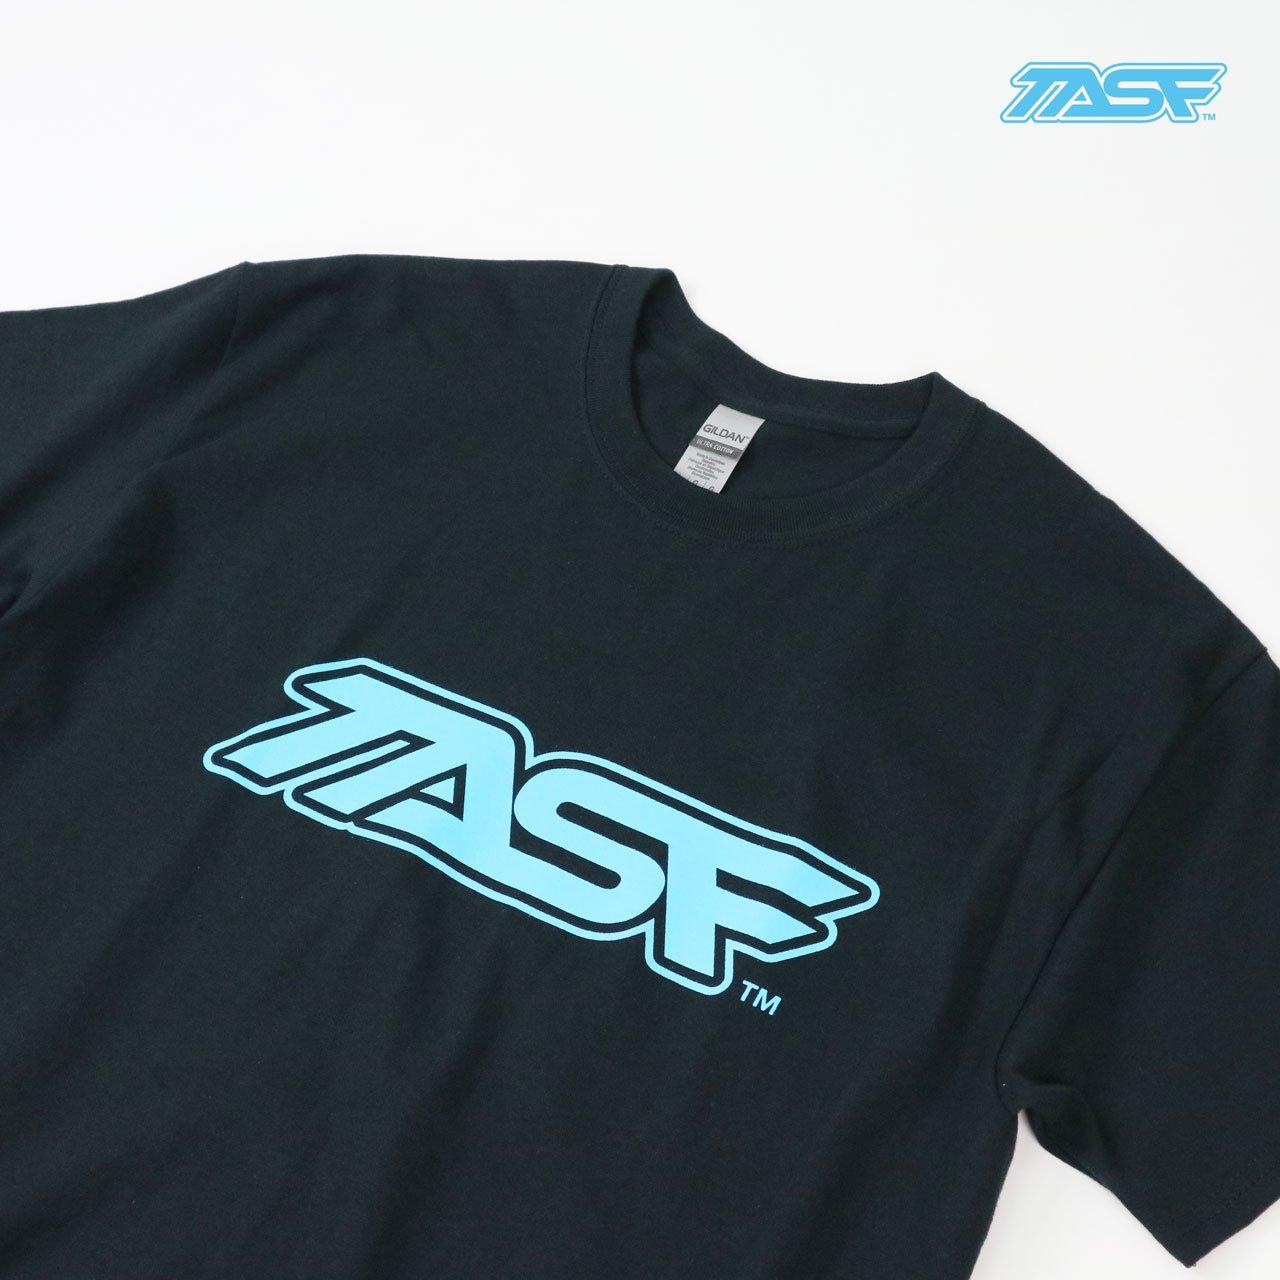 TASF Logo Tee -BLK-